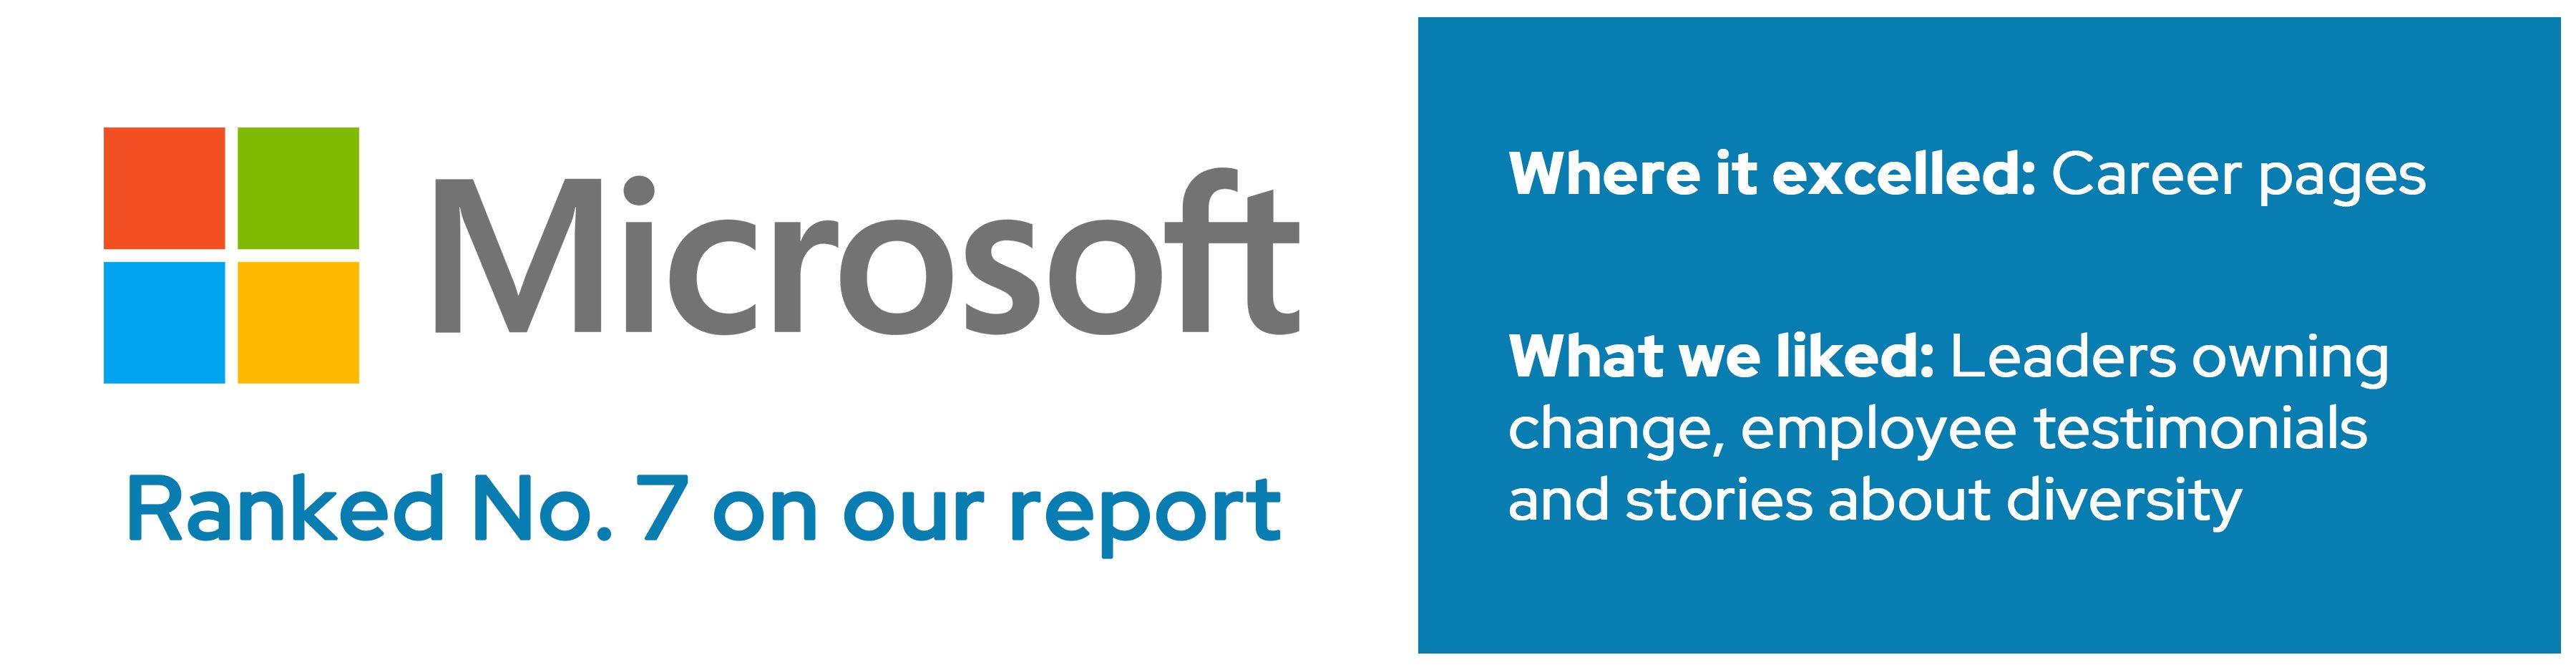 EBbestpracticesblog-Microsoft